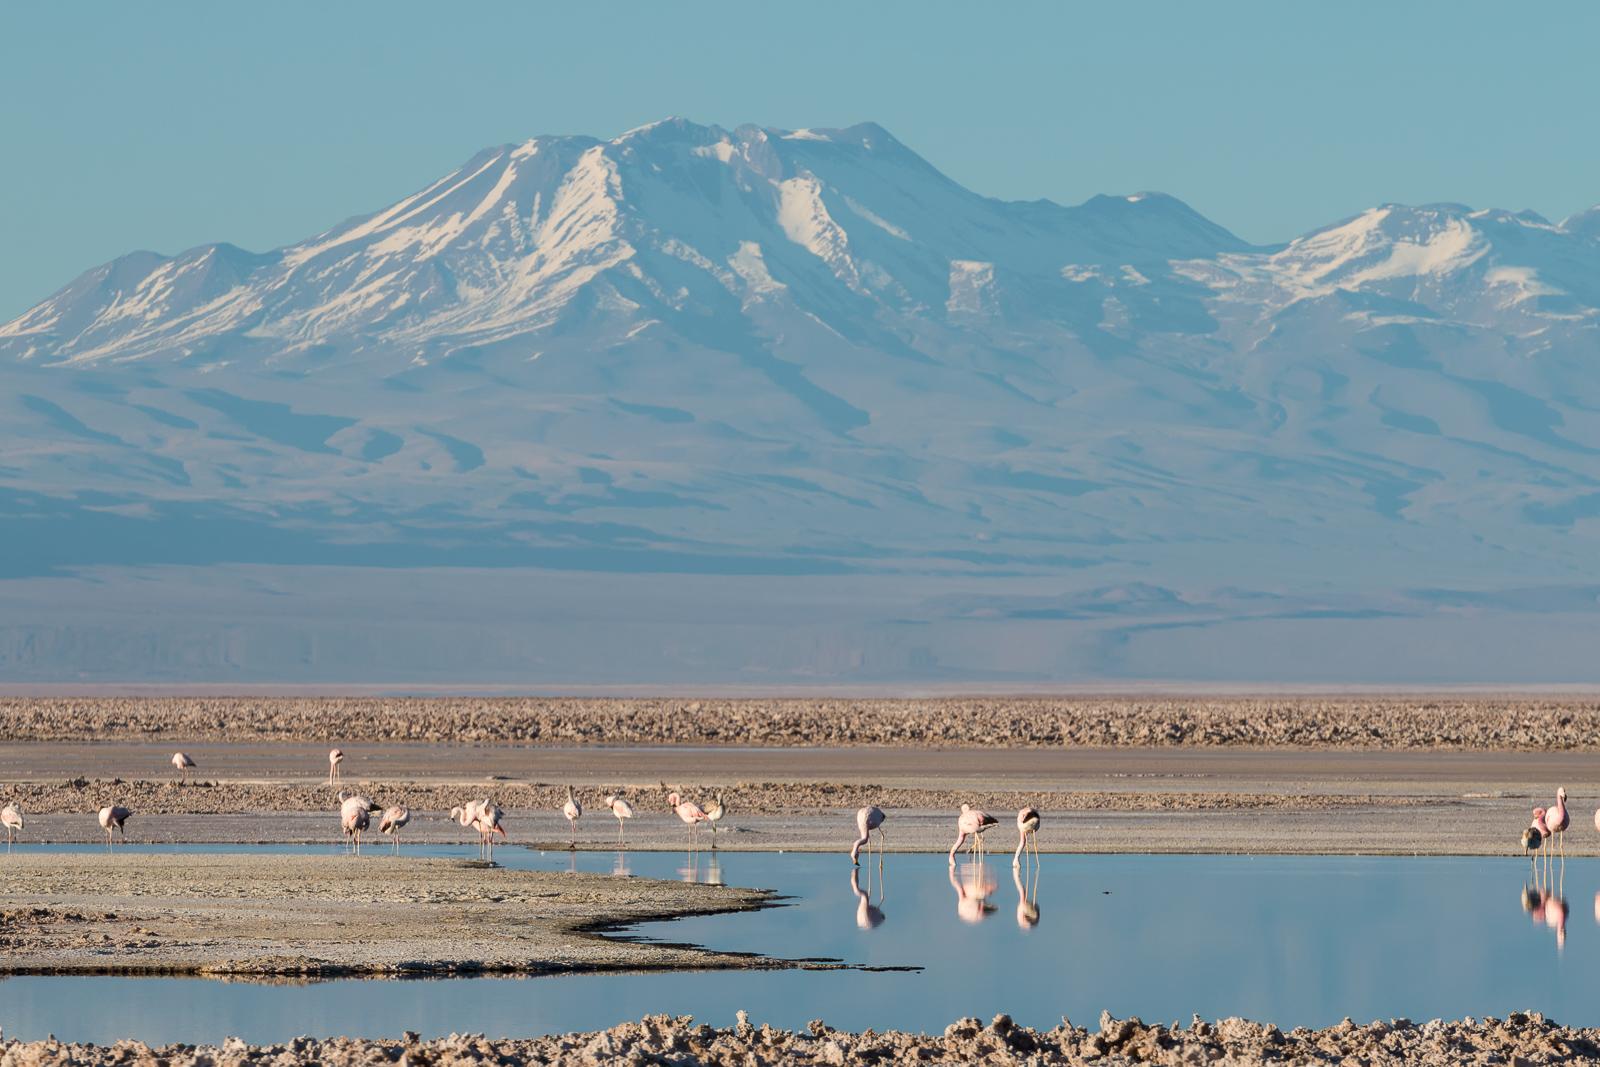 Lagunas Altiplanicas - Atacama desert, Chile